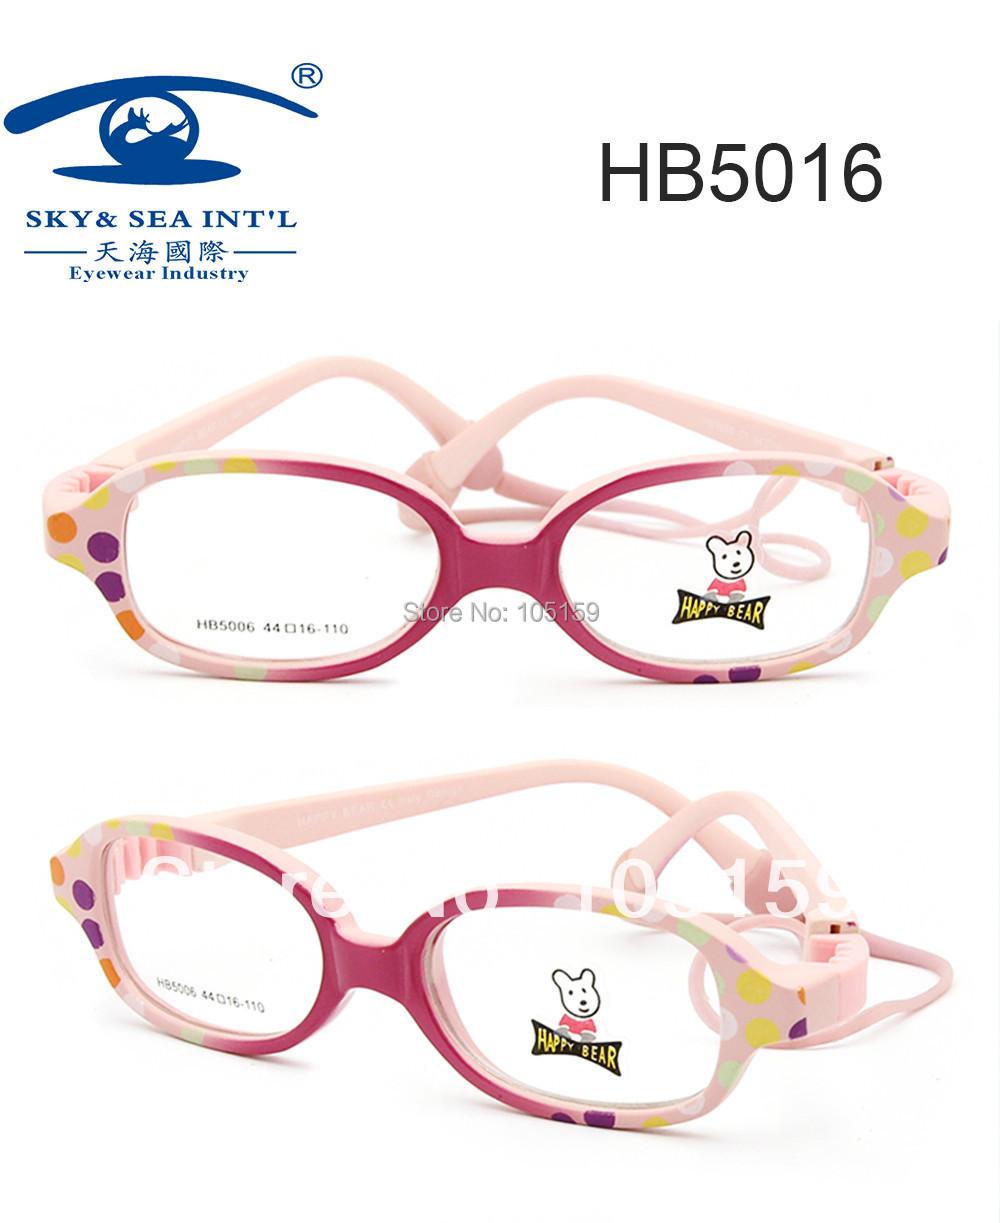 Rubber Eyeglass Frames For Toddlers : Aliexpress.com : Buy (10pcs/lot) Cheap Wholesale Kids ...